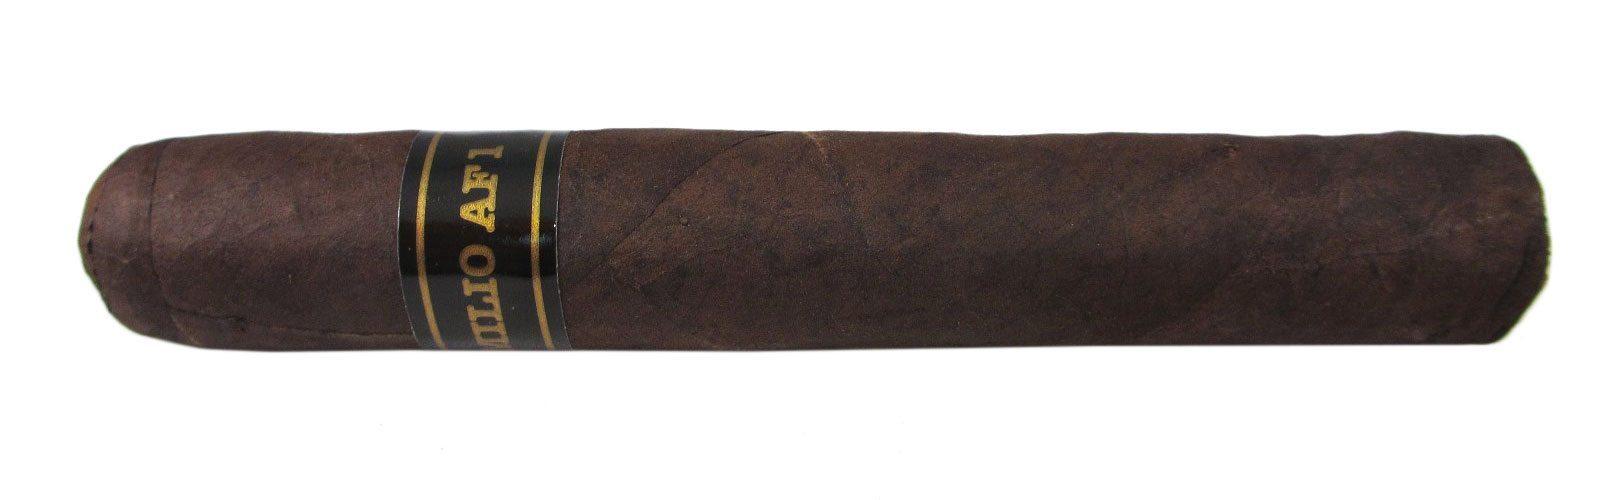 Blind Cigar Review: Emilio | AF1 Gran Toro